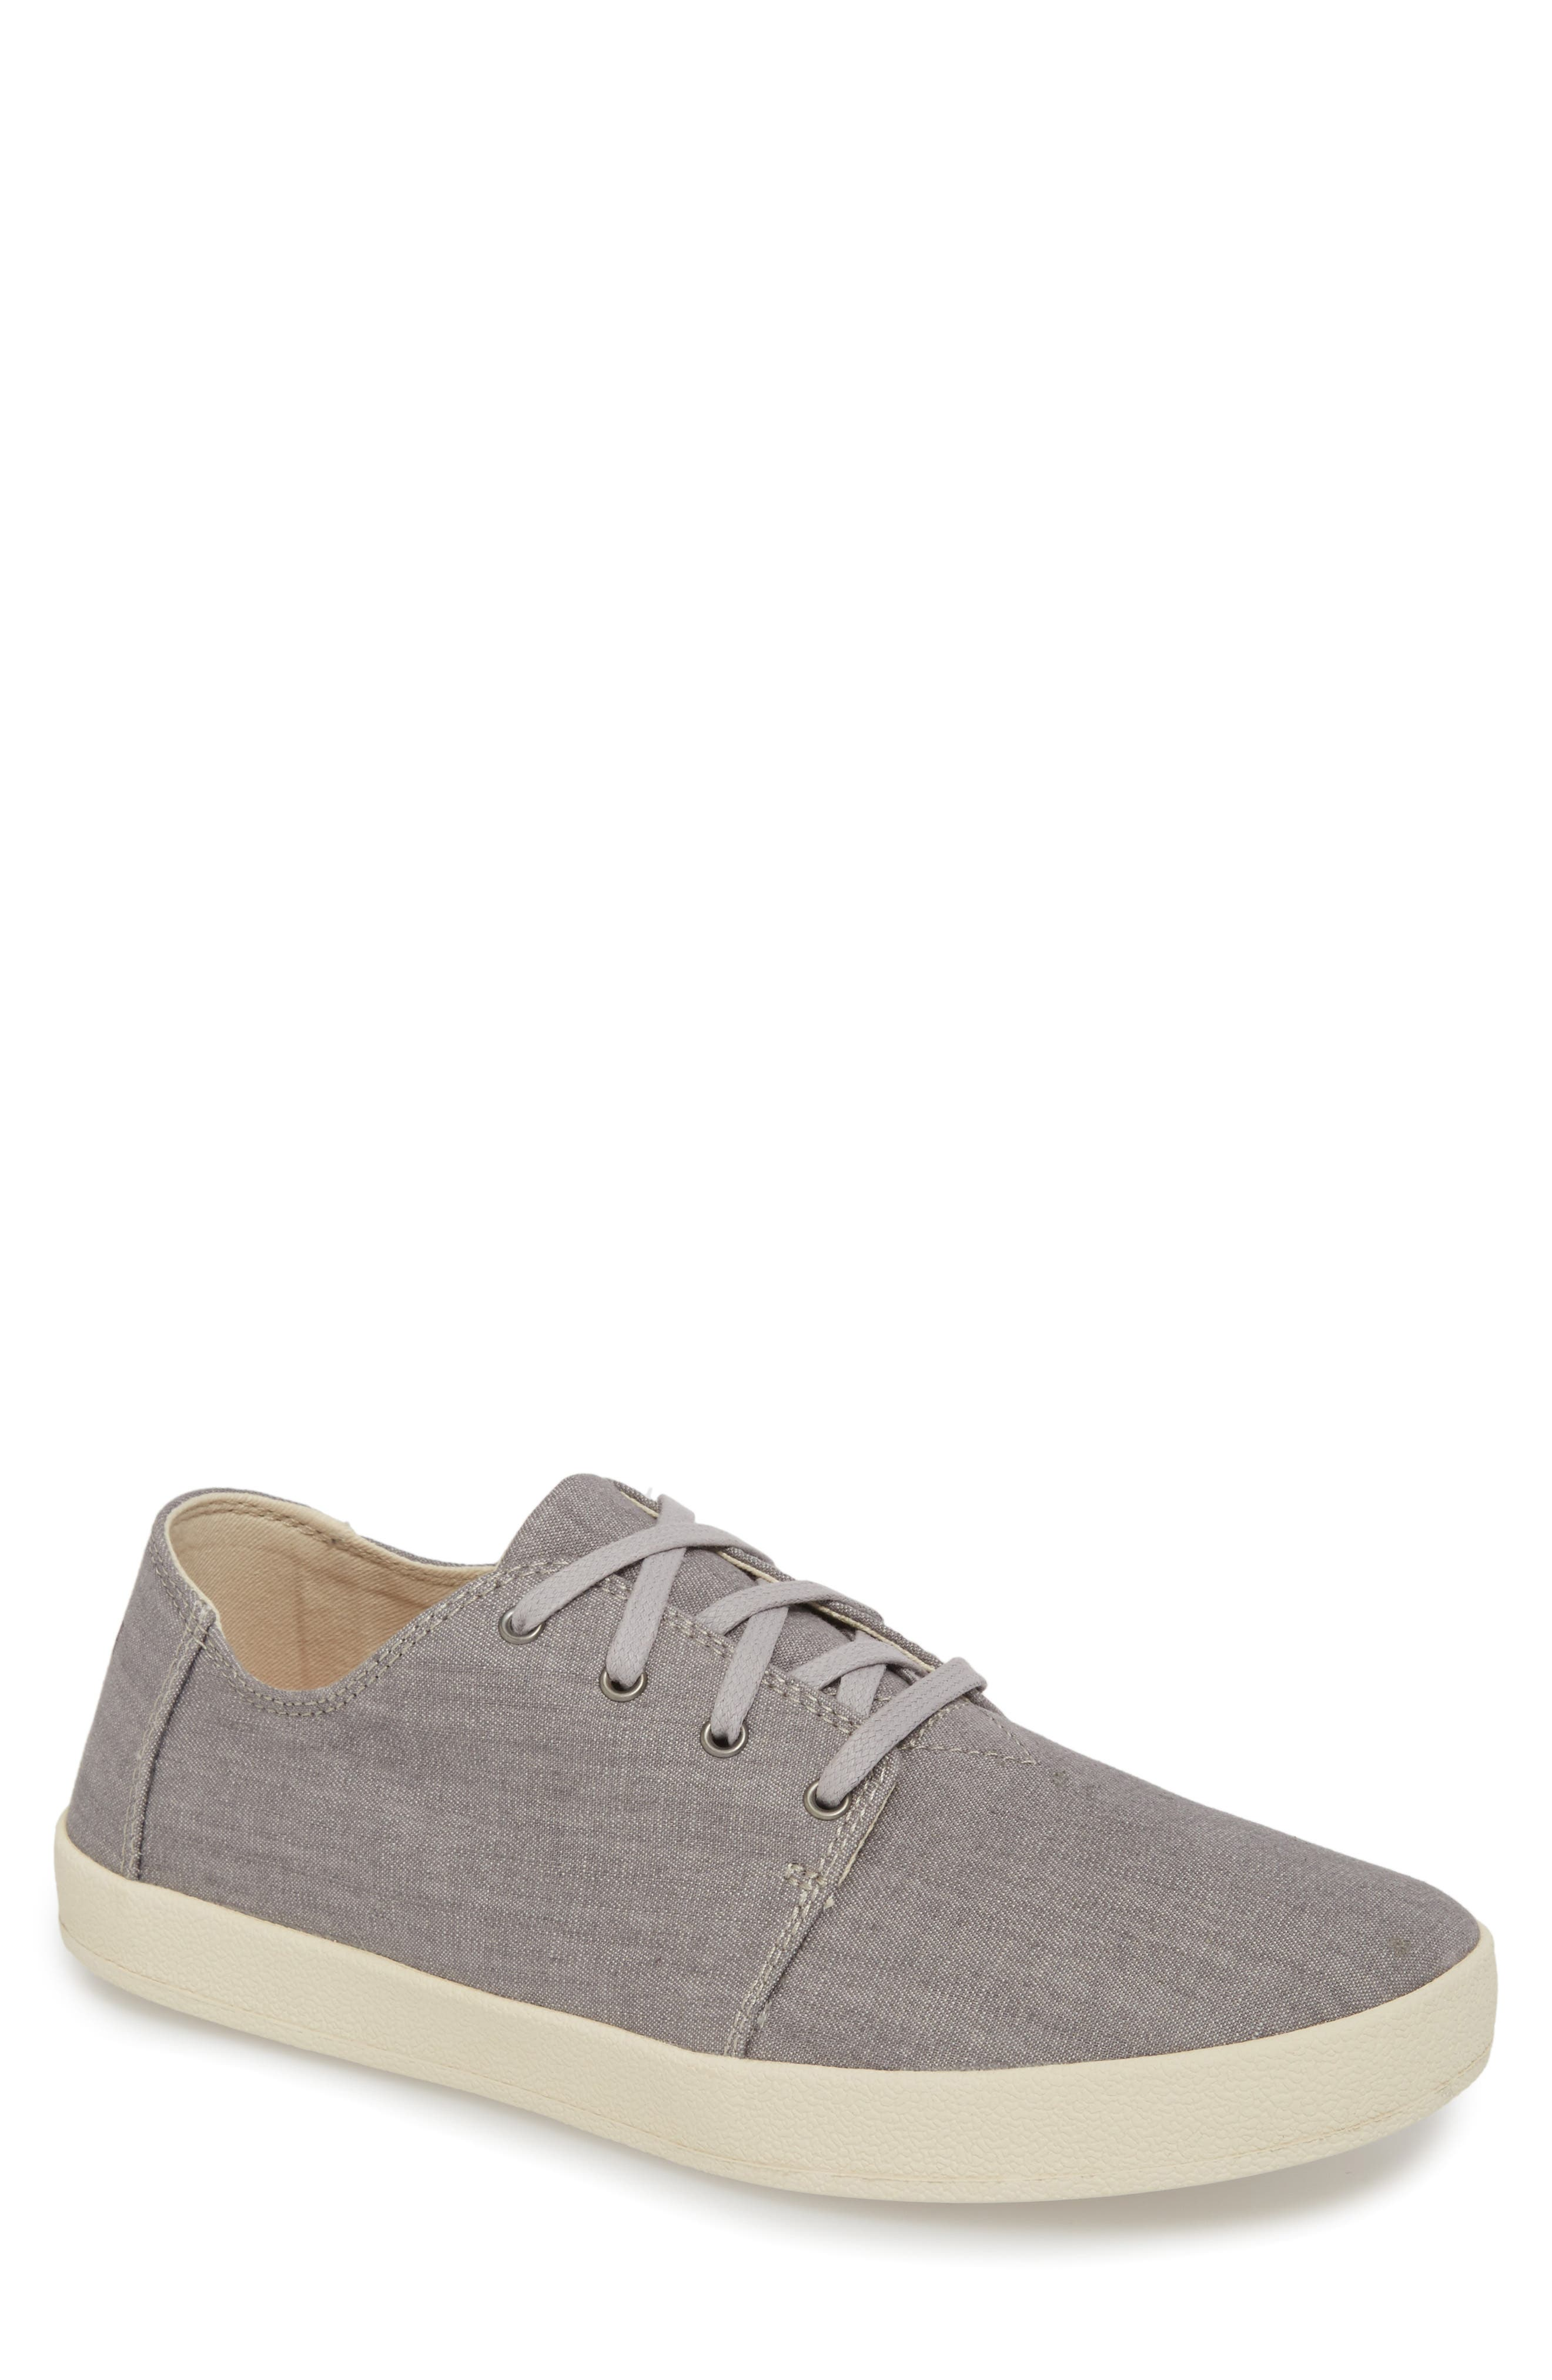 Payton Sneaker, Main, color, GREY DENIM